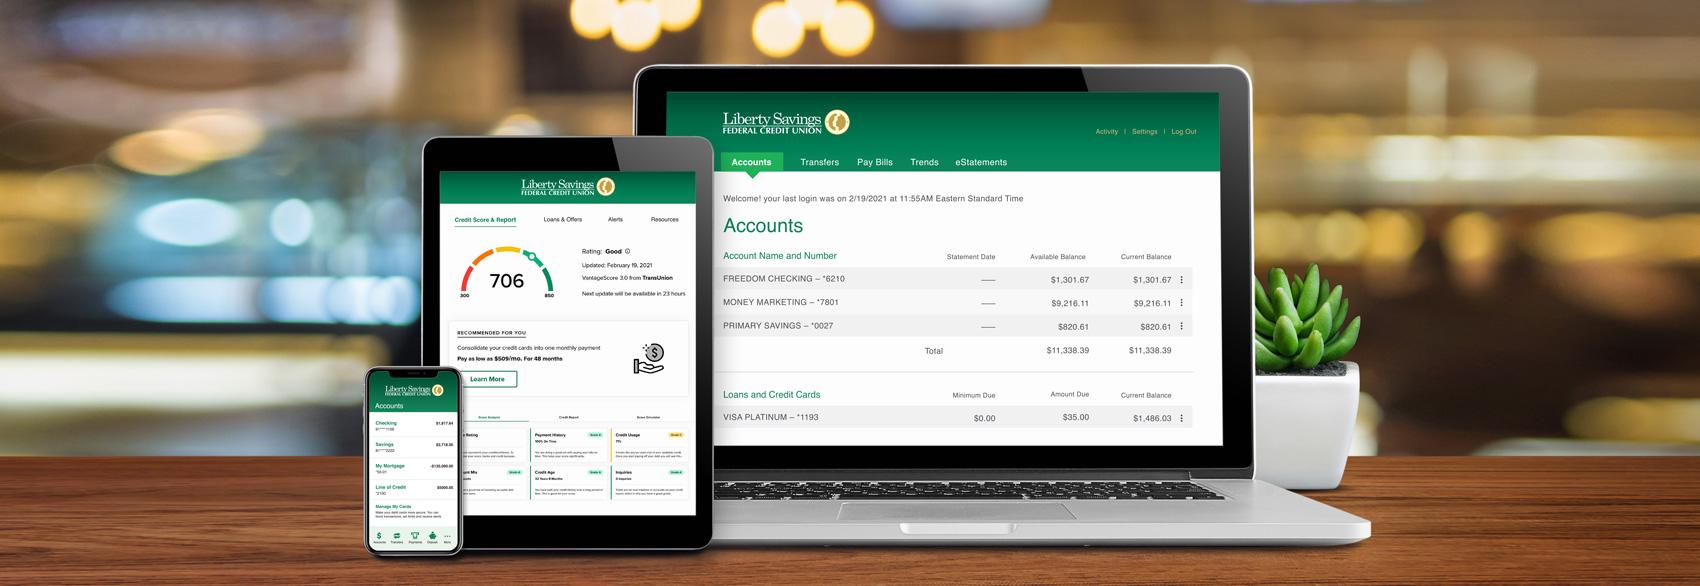 LibertyLink Online Banking – Liberty Savings Federal Credit Union